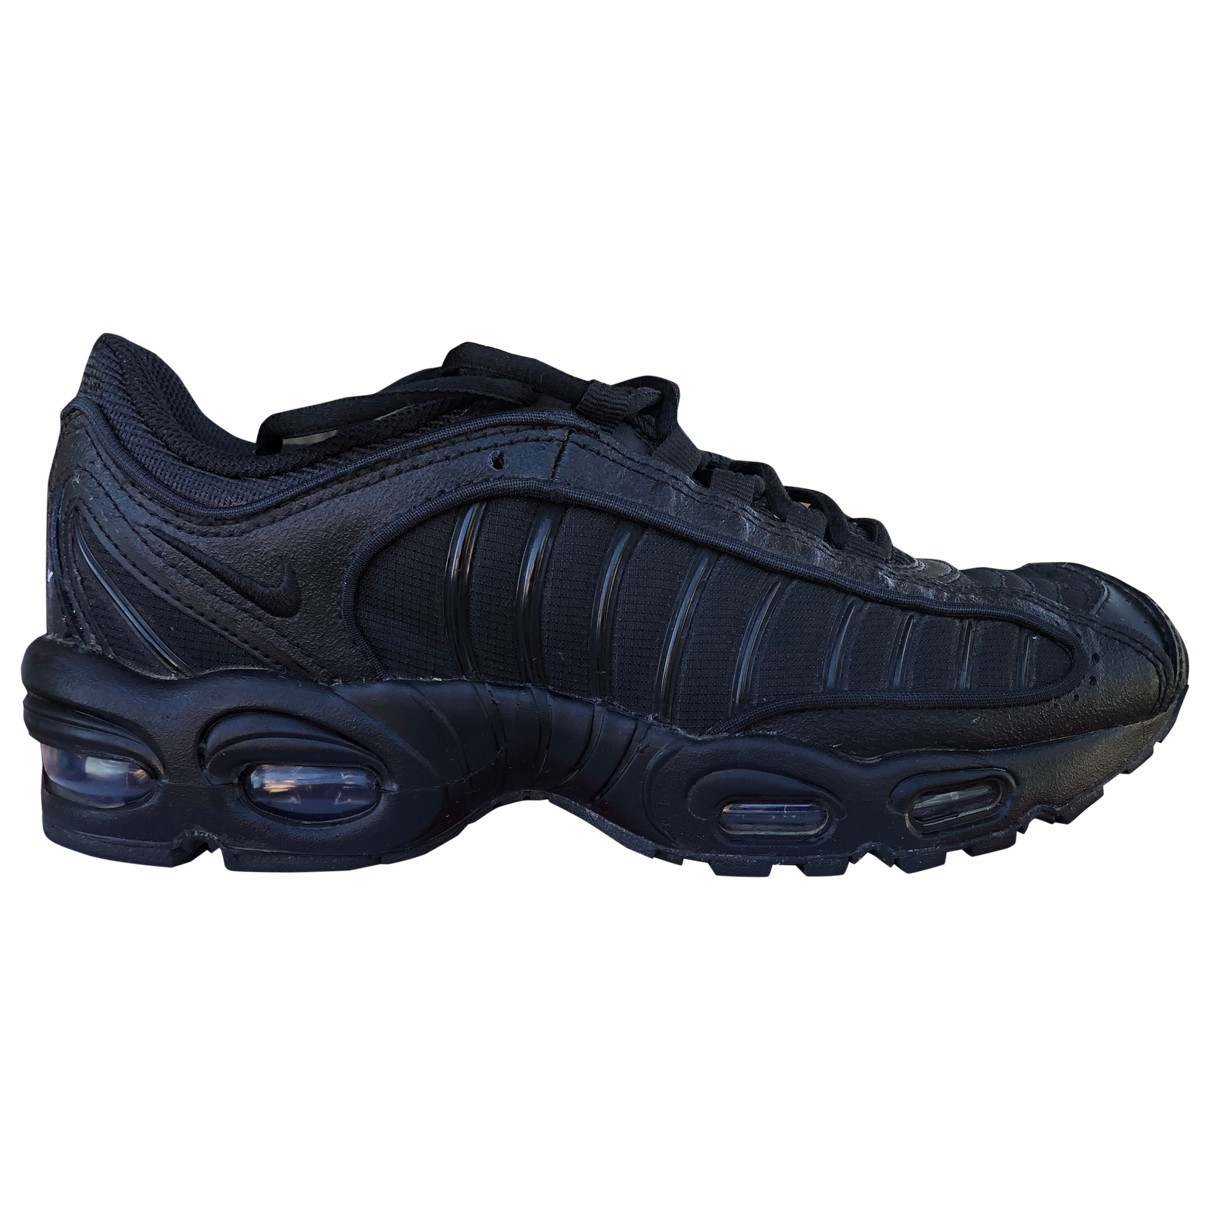 Nike Air Max Tailwind IV Black Cloth Trainers for Men 41 EU